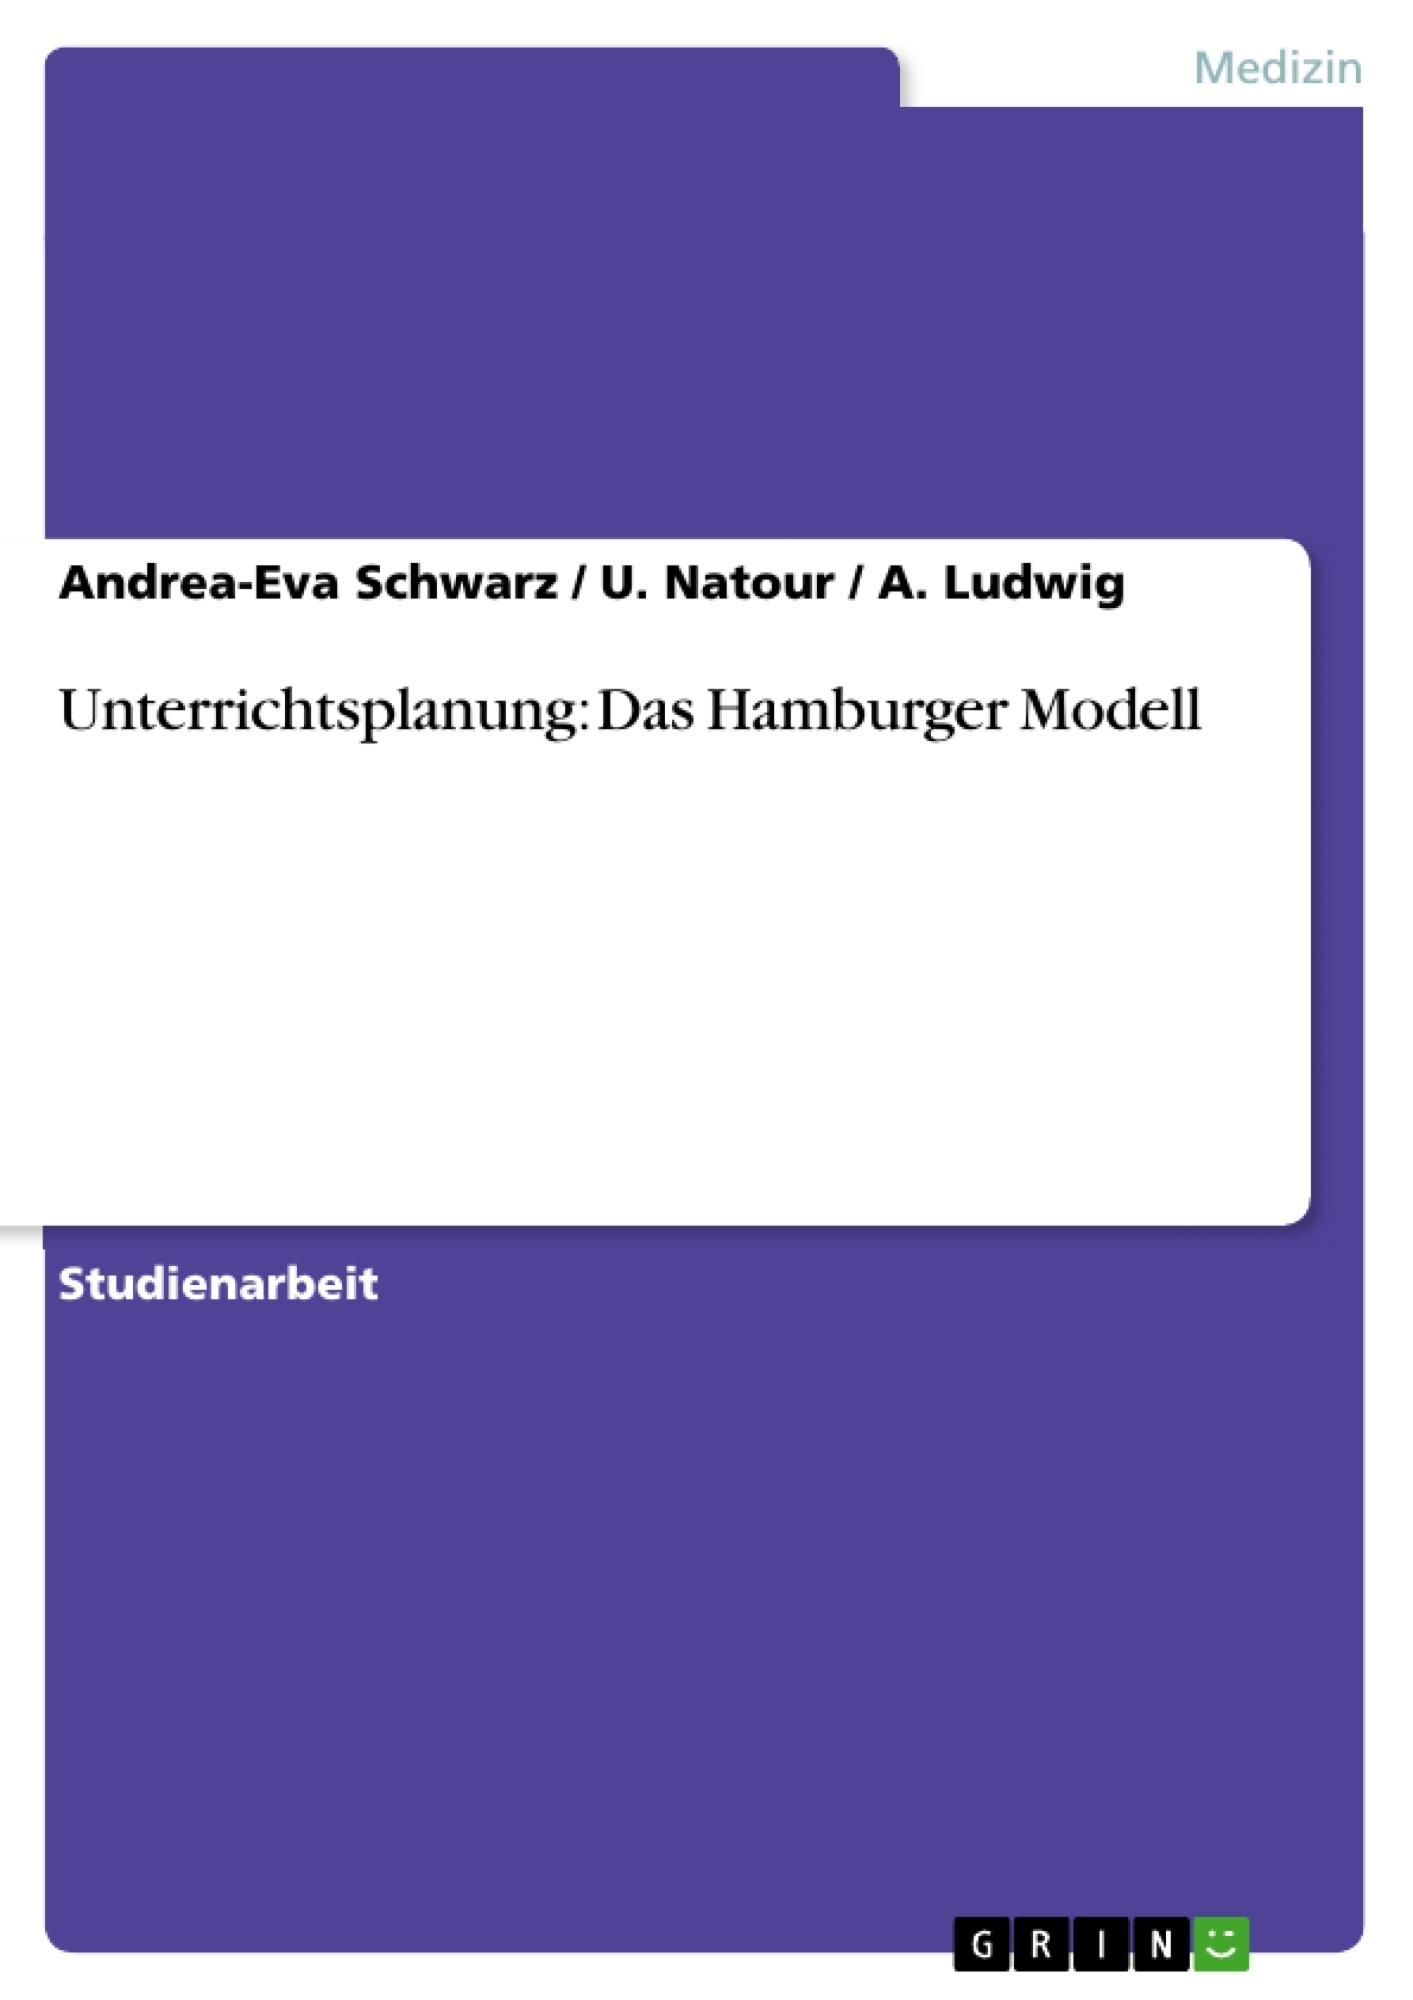 Titel: Unterrichtsplanung: Das Hamburger Modell